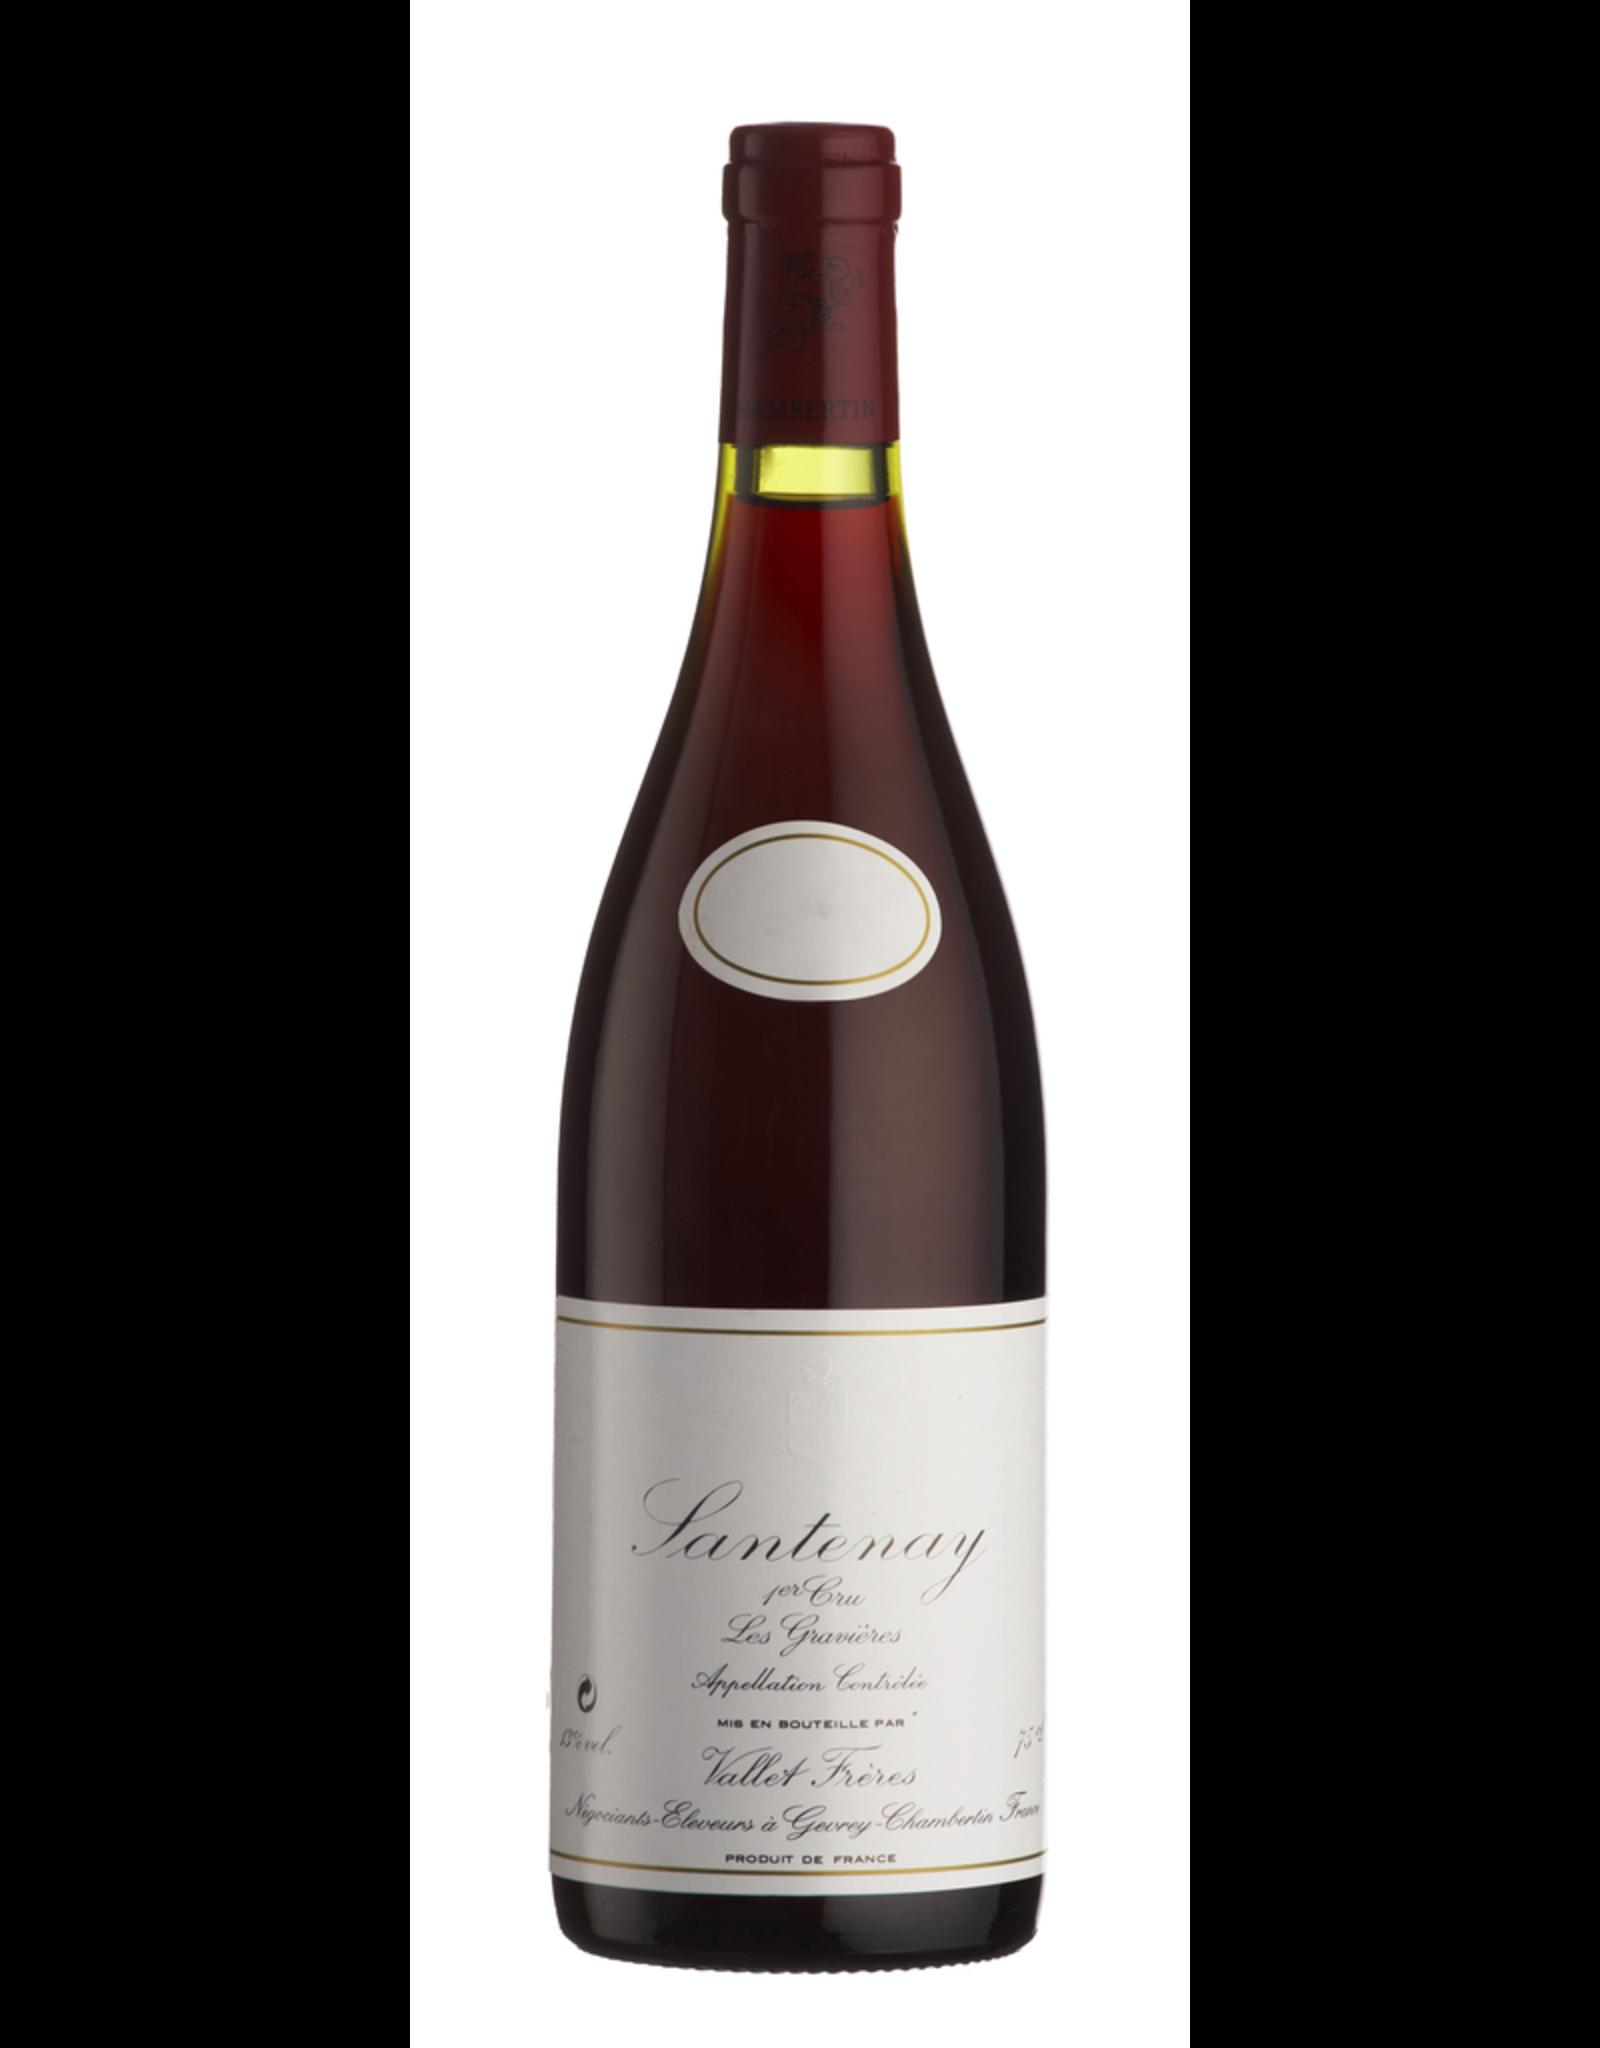 Red Wine 2000, Vallet-Freres Santenay 1er Cru Les Gravieres, Pinot Noir, Gevrey-Chambertin, Burgundy, France, 13% Alc, CT91